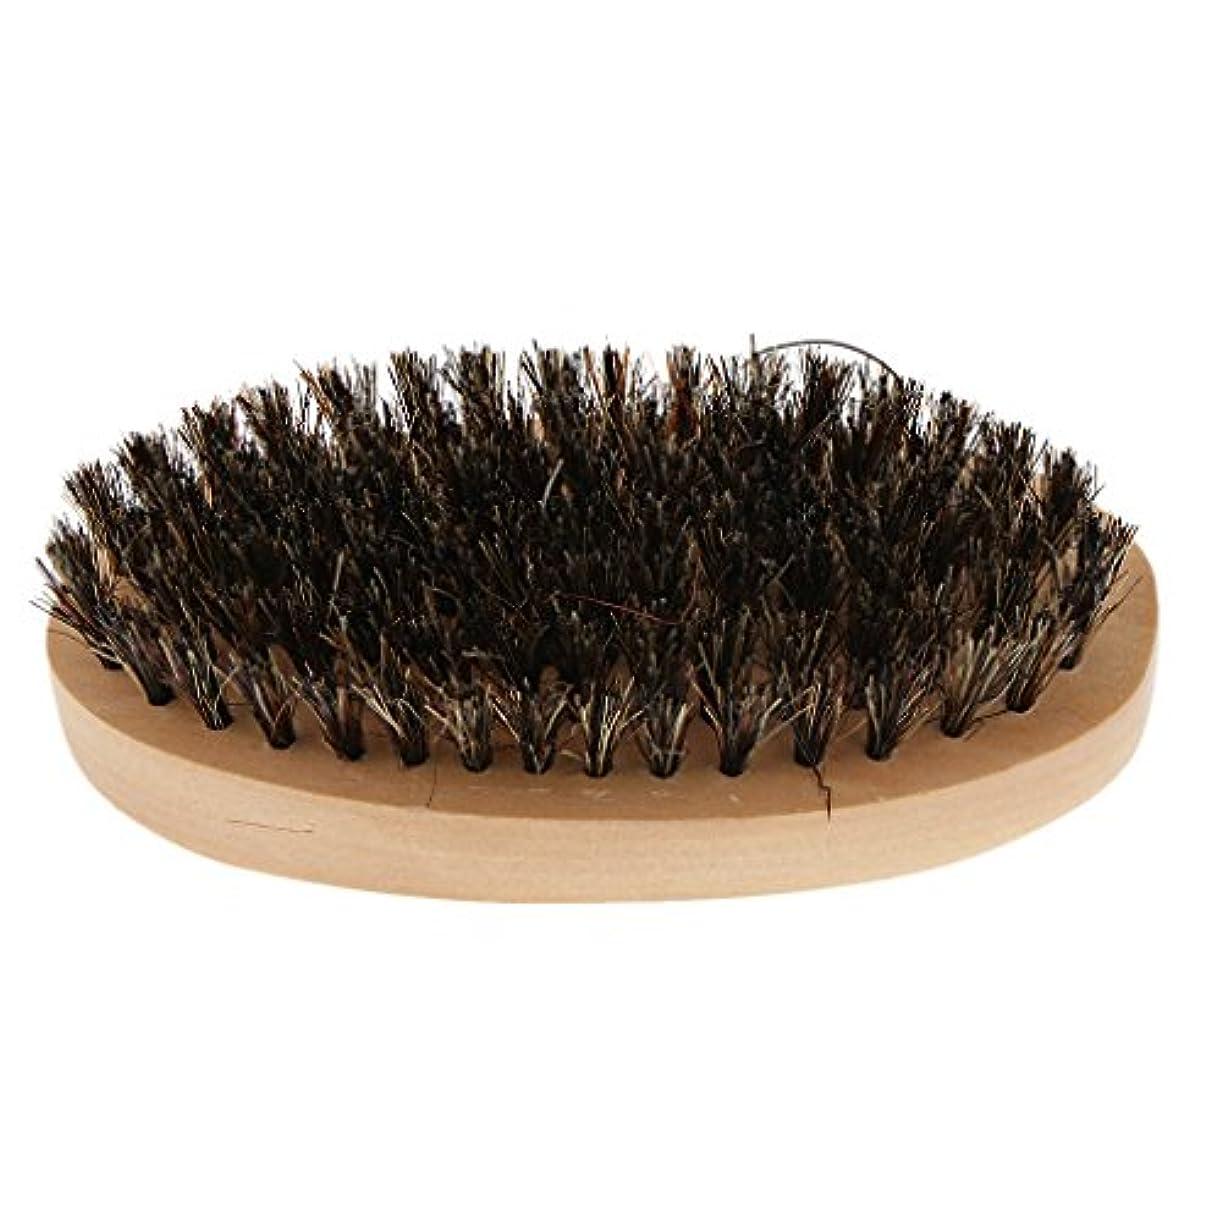 Baosity ビアードブラシ 口ひげブラシ メンズ 木製ハンドル ヘアブラシ